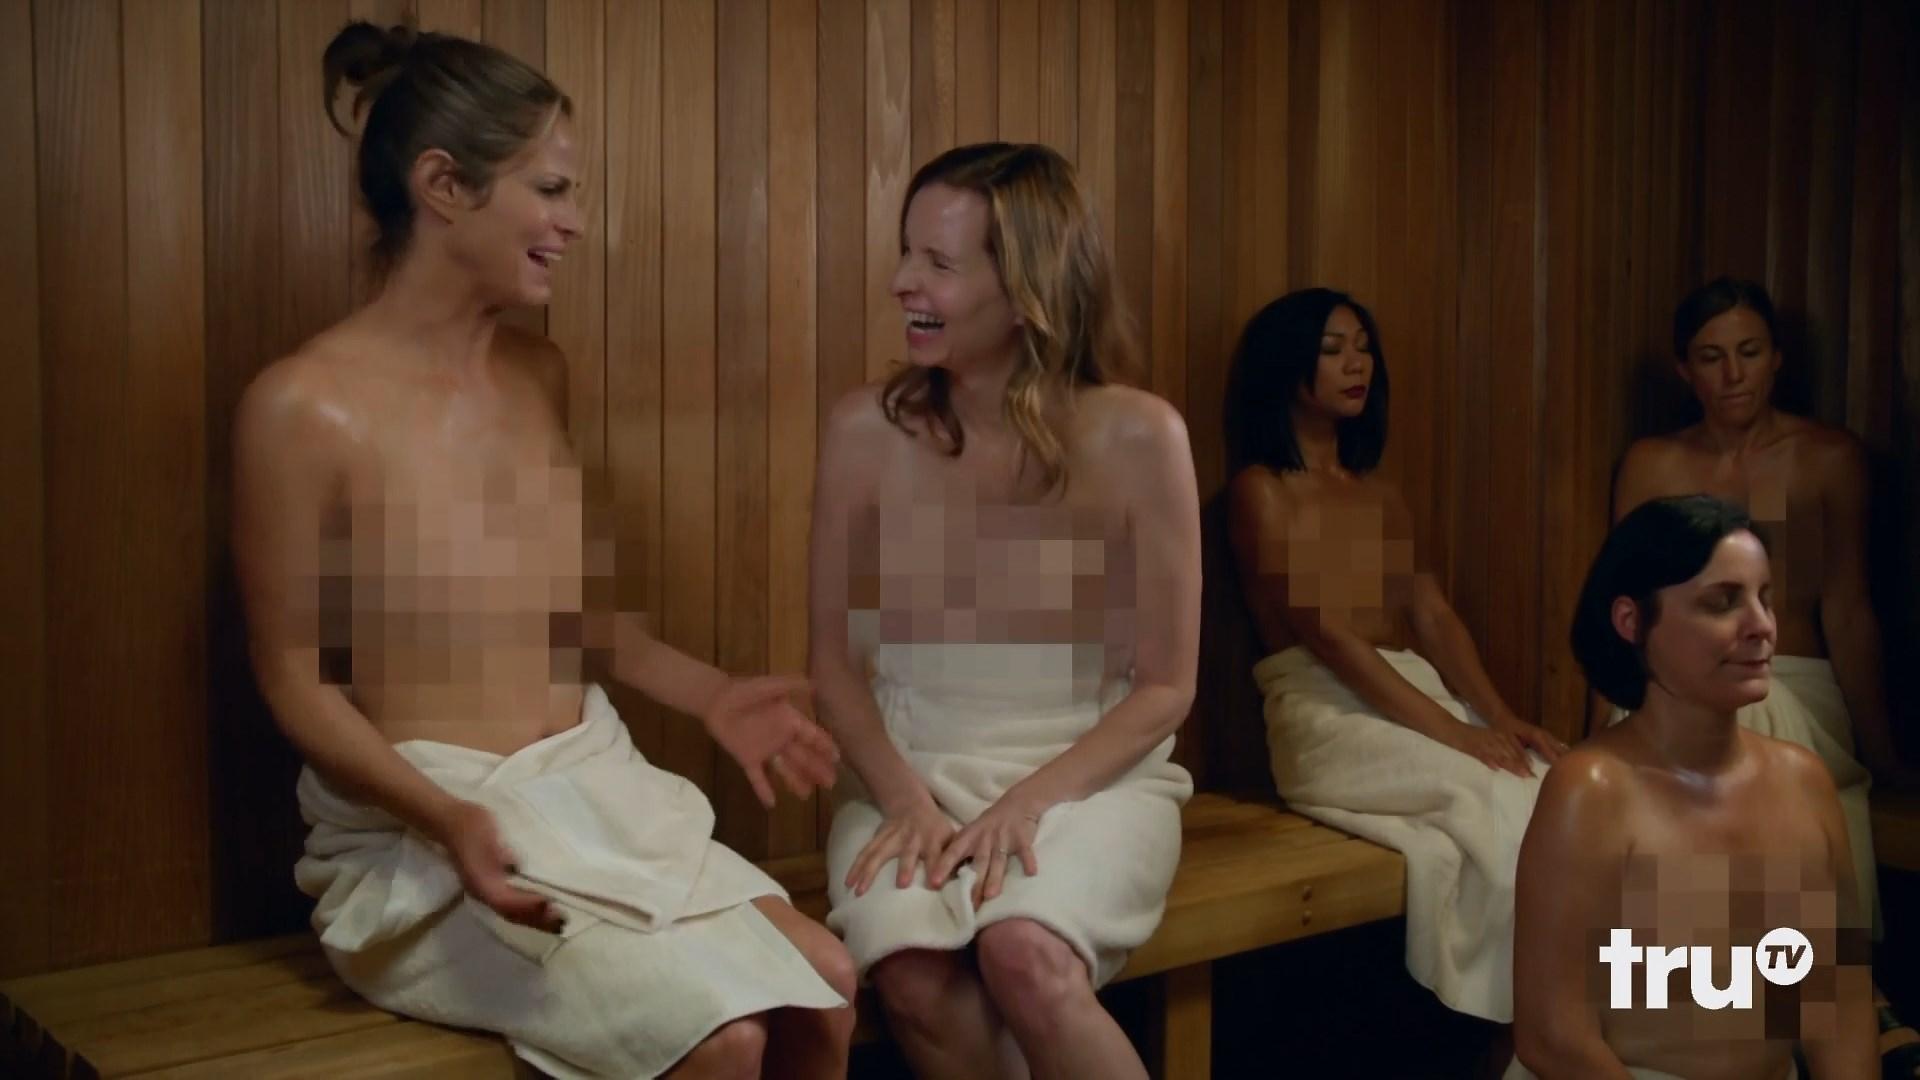 Andrea Savage Nude Pics nude video celebs » andrea savage nude - i'm sorry s02e04 (2019)